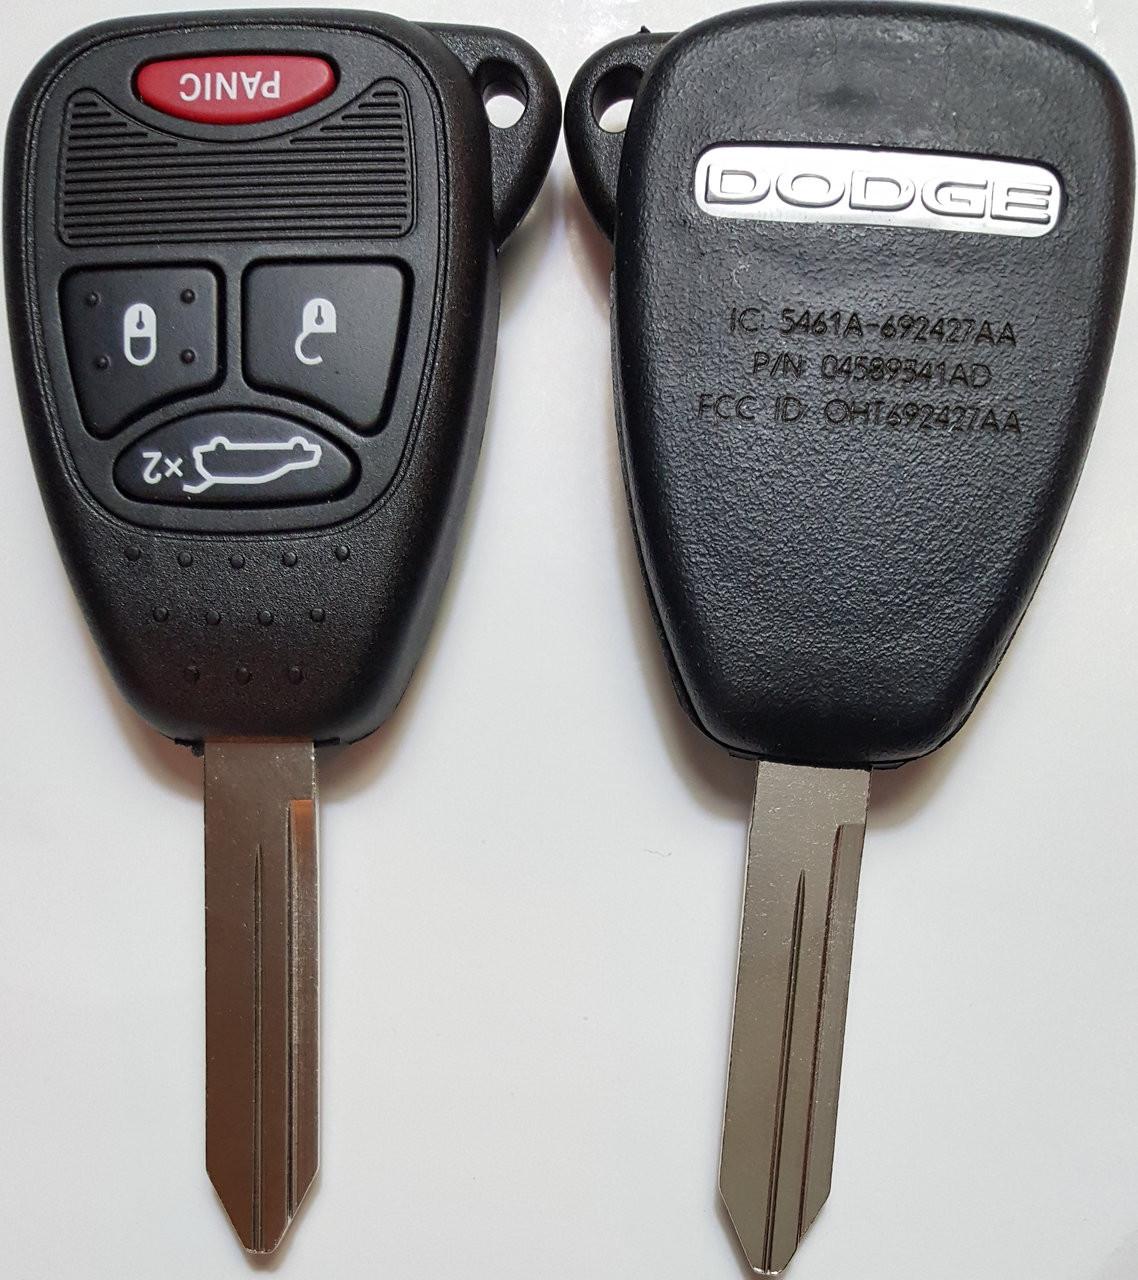 Dodge Durango , Avenger , Charger 04589341 , 68092978 , 05179512 , 05191964 OHT692427AA 5461A-692427AA Key - Remote Head